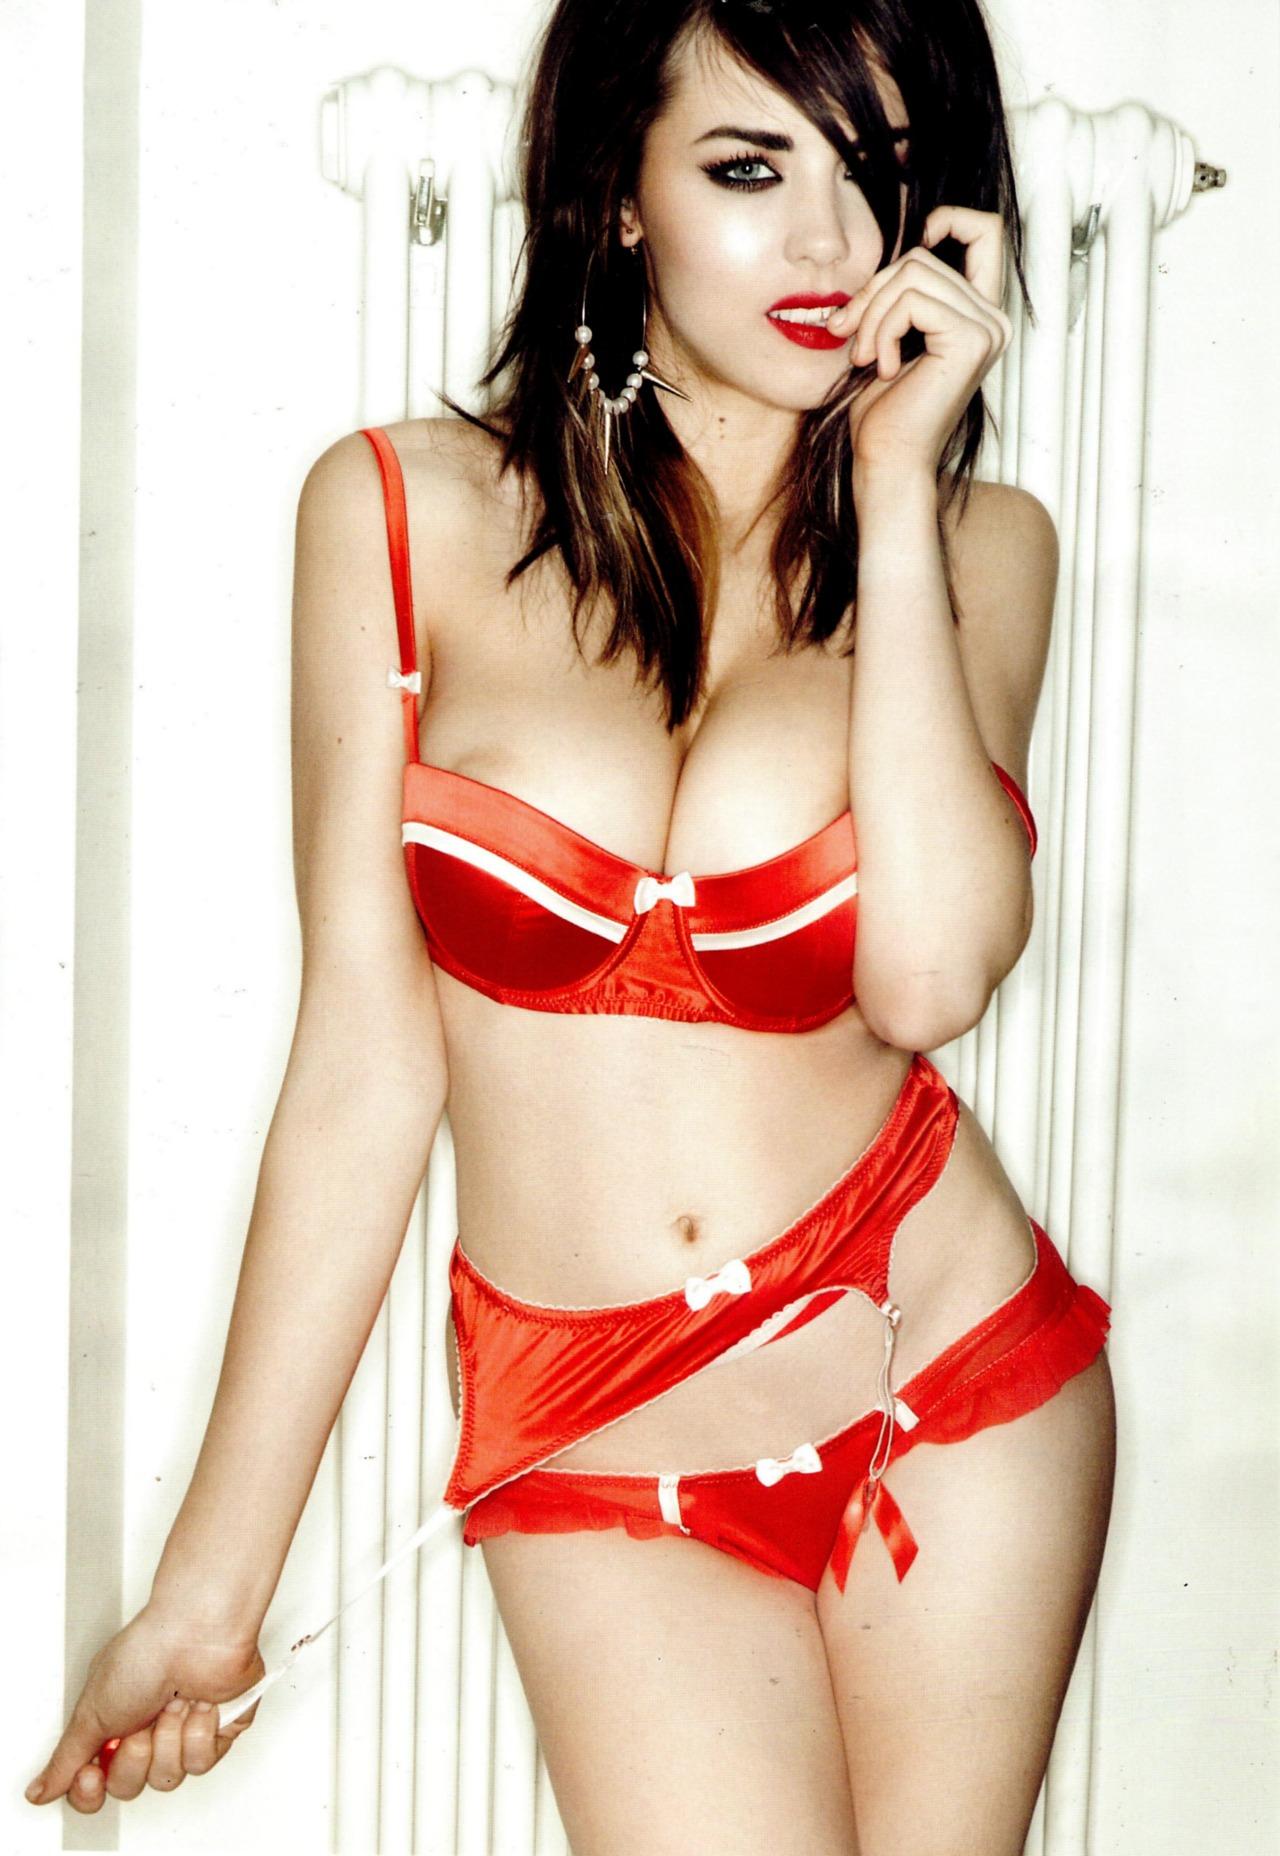 colby nude pics cushman Danielle